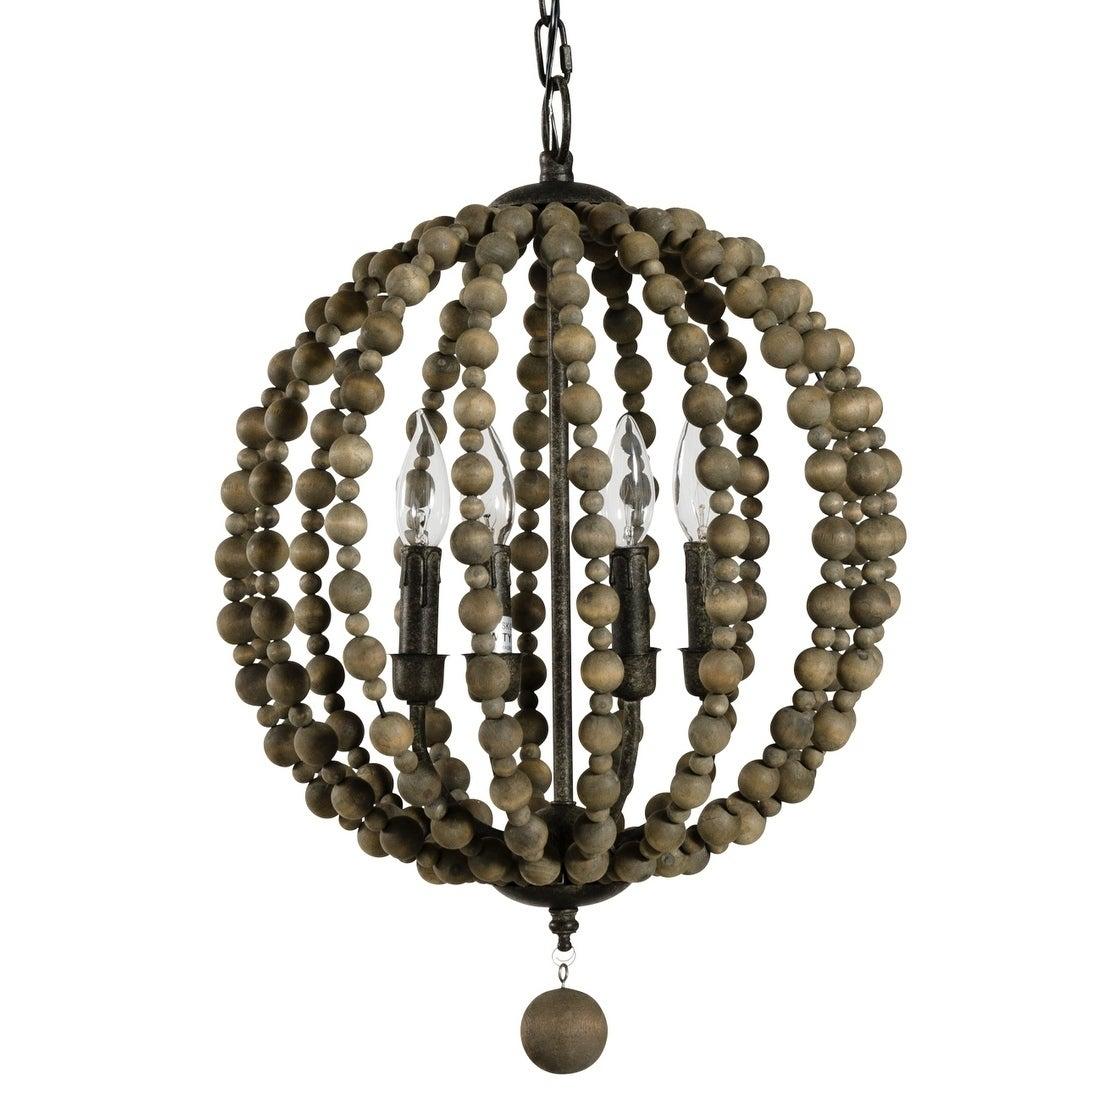 Alden Décor Sequoia Pendant In Wood Beads Within Alden 3 Light Single Globe Pendants (Image 6 of 30)